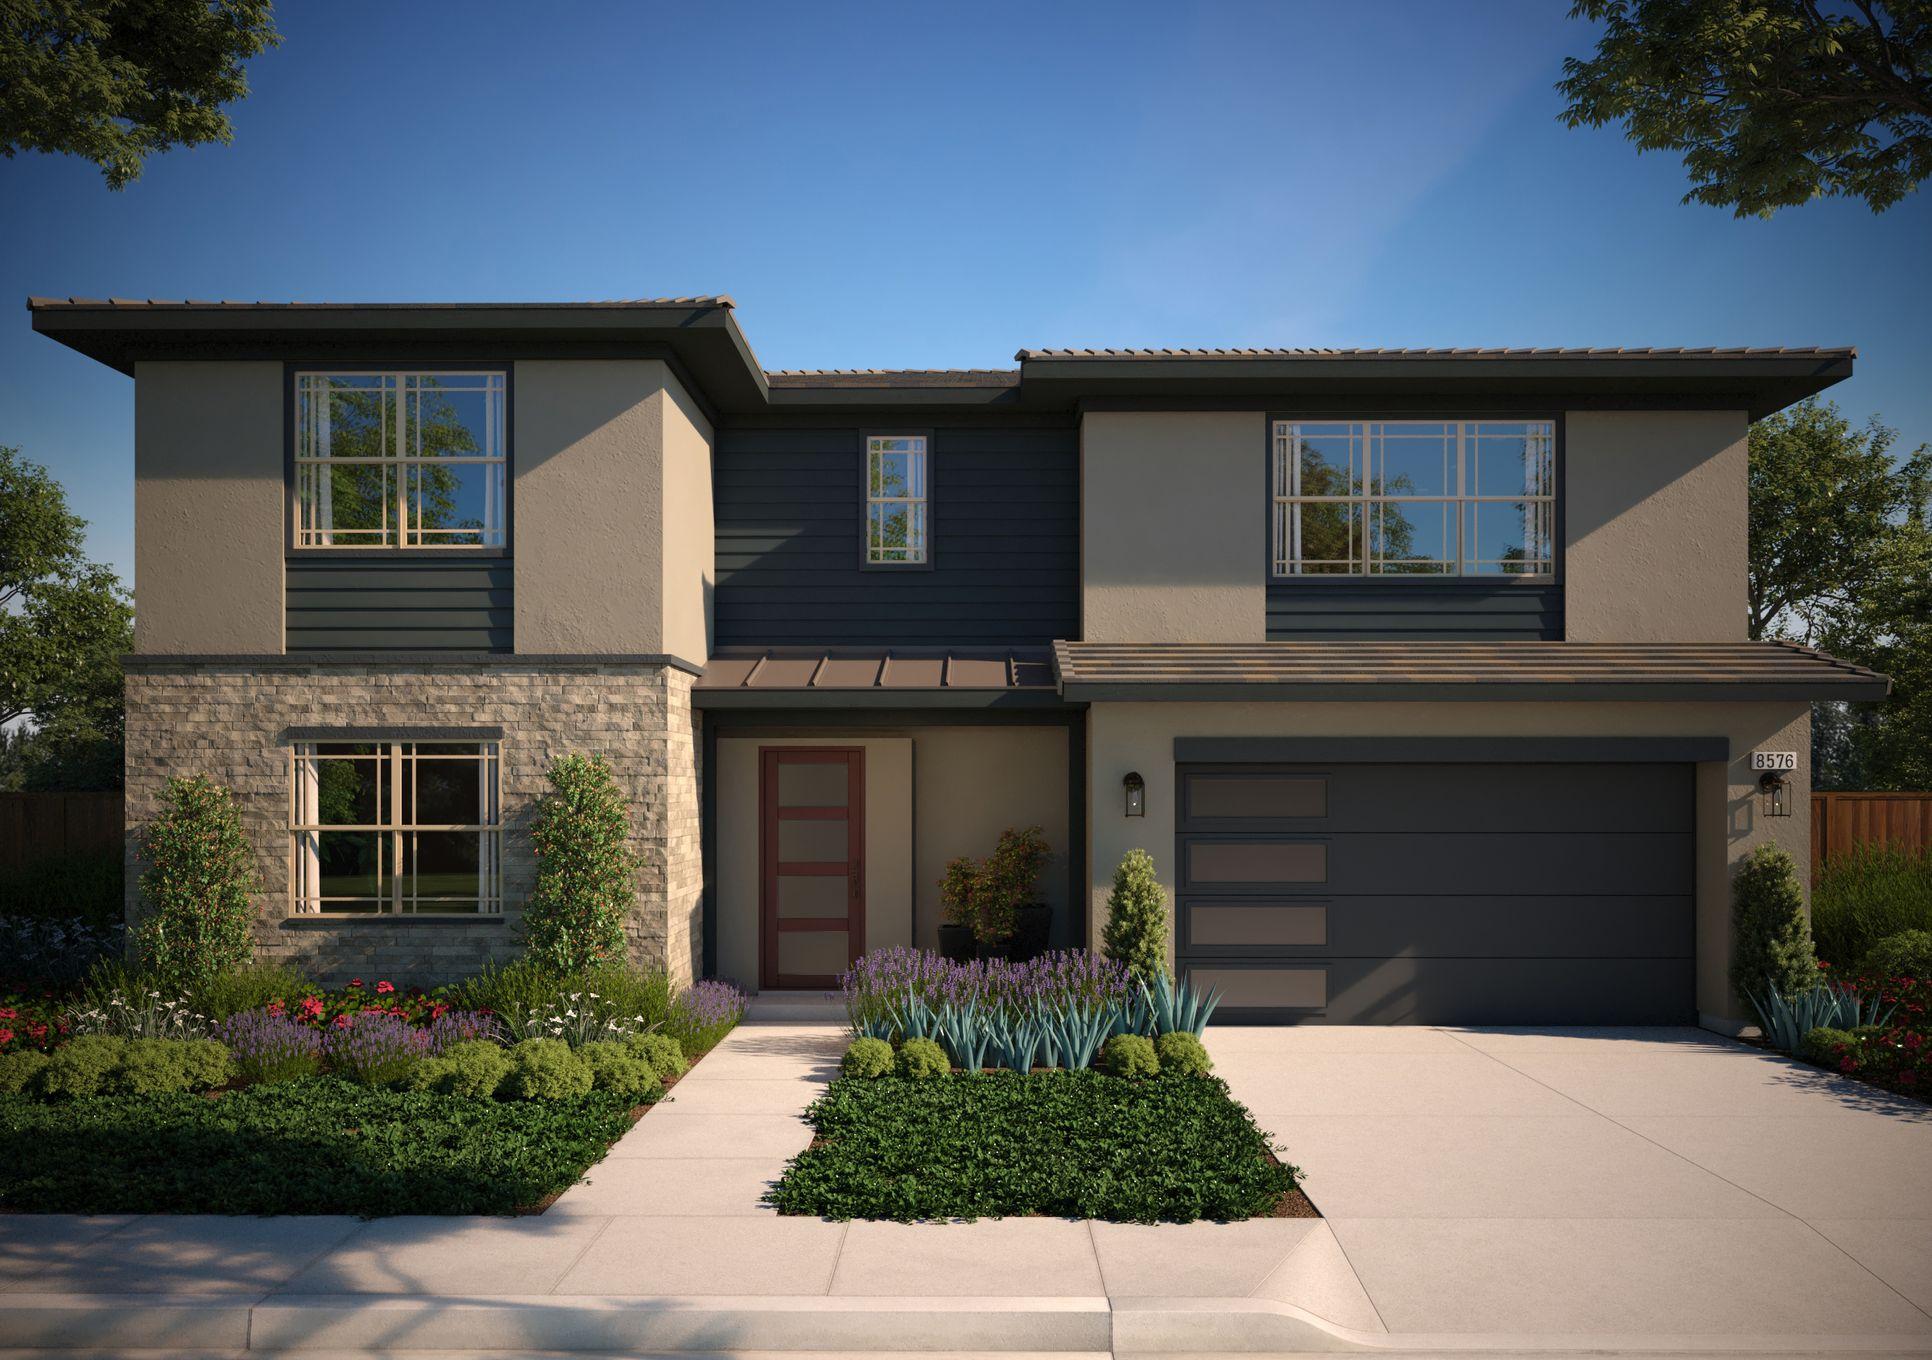 Residence 3B Modern Prairie:Residence 3B Modern Prairie